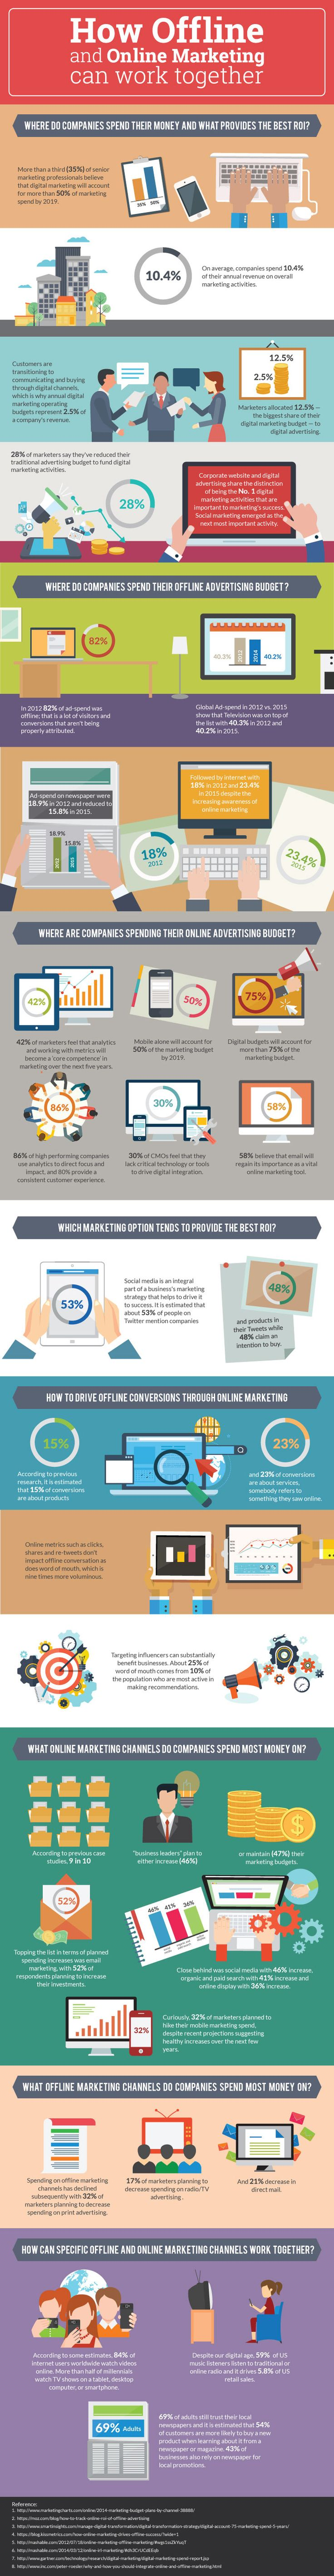 Online vs Offline #Marketing - Stats That Show Where to Spend Your Budget #Infographic #SocialMedia #SEO #PPC #SEM #Digital